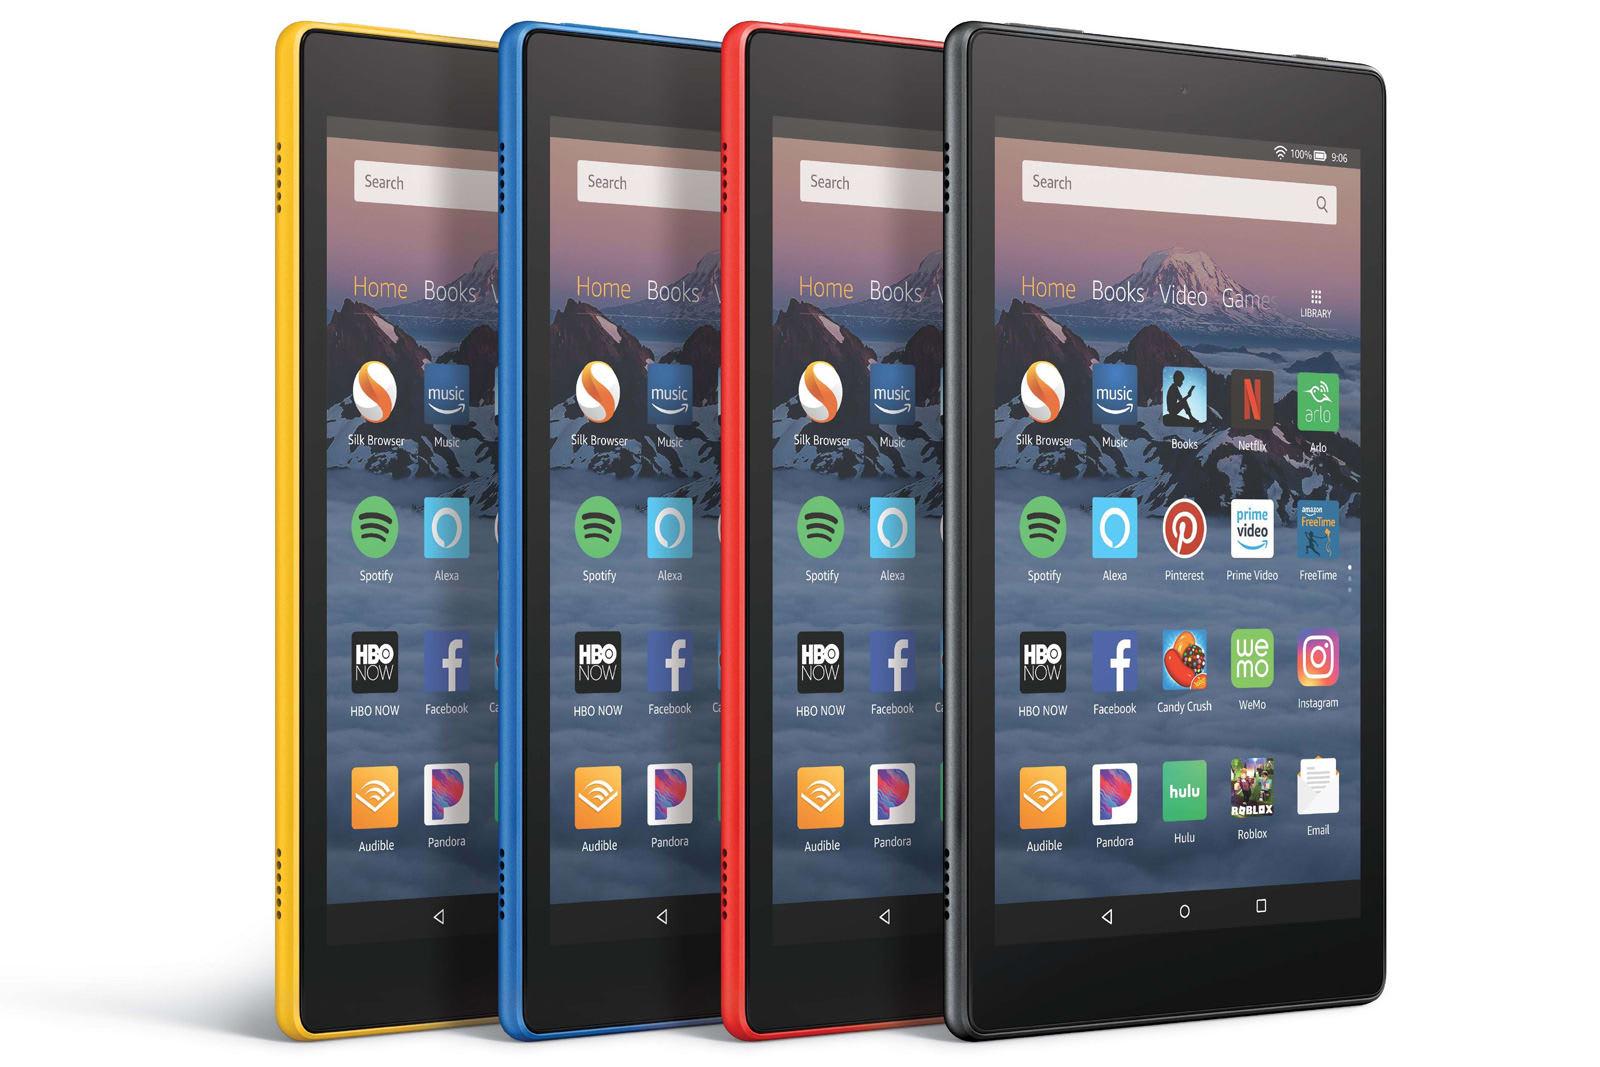 amazon fire hd tablets now receive alexa drop in calls